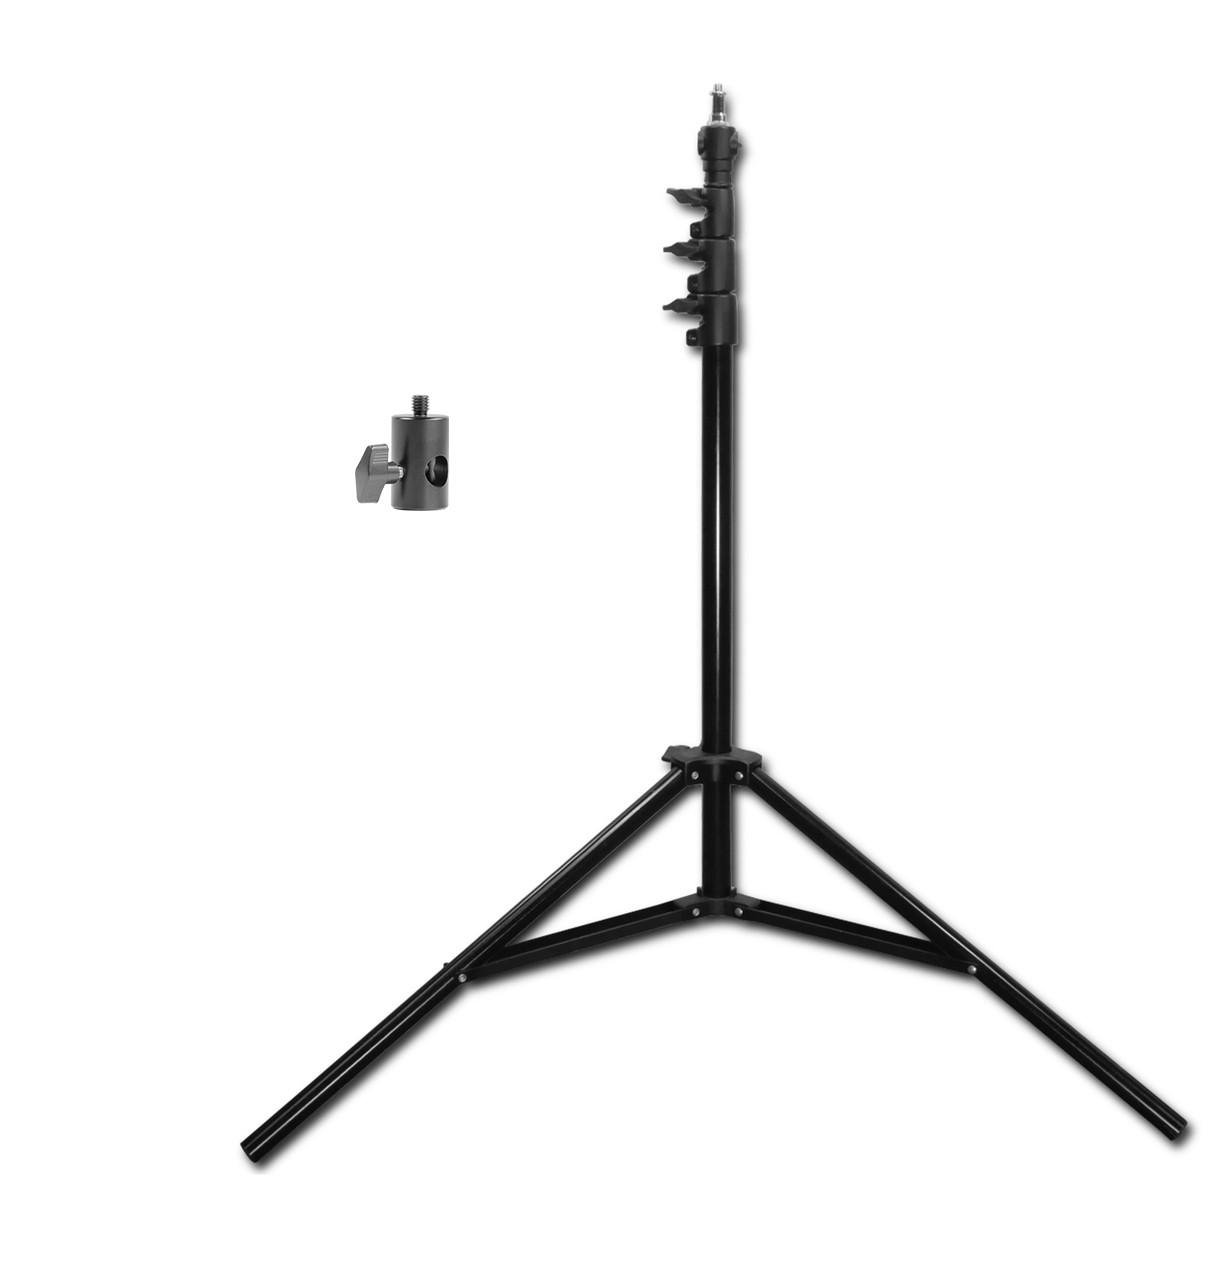 Medium Duty Freestand Kit ProLine Plus